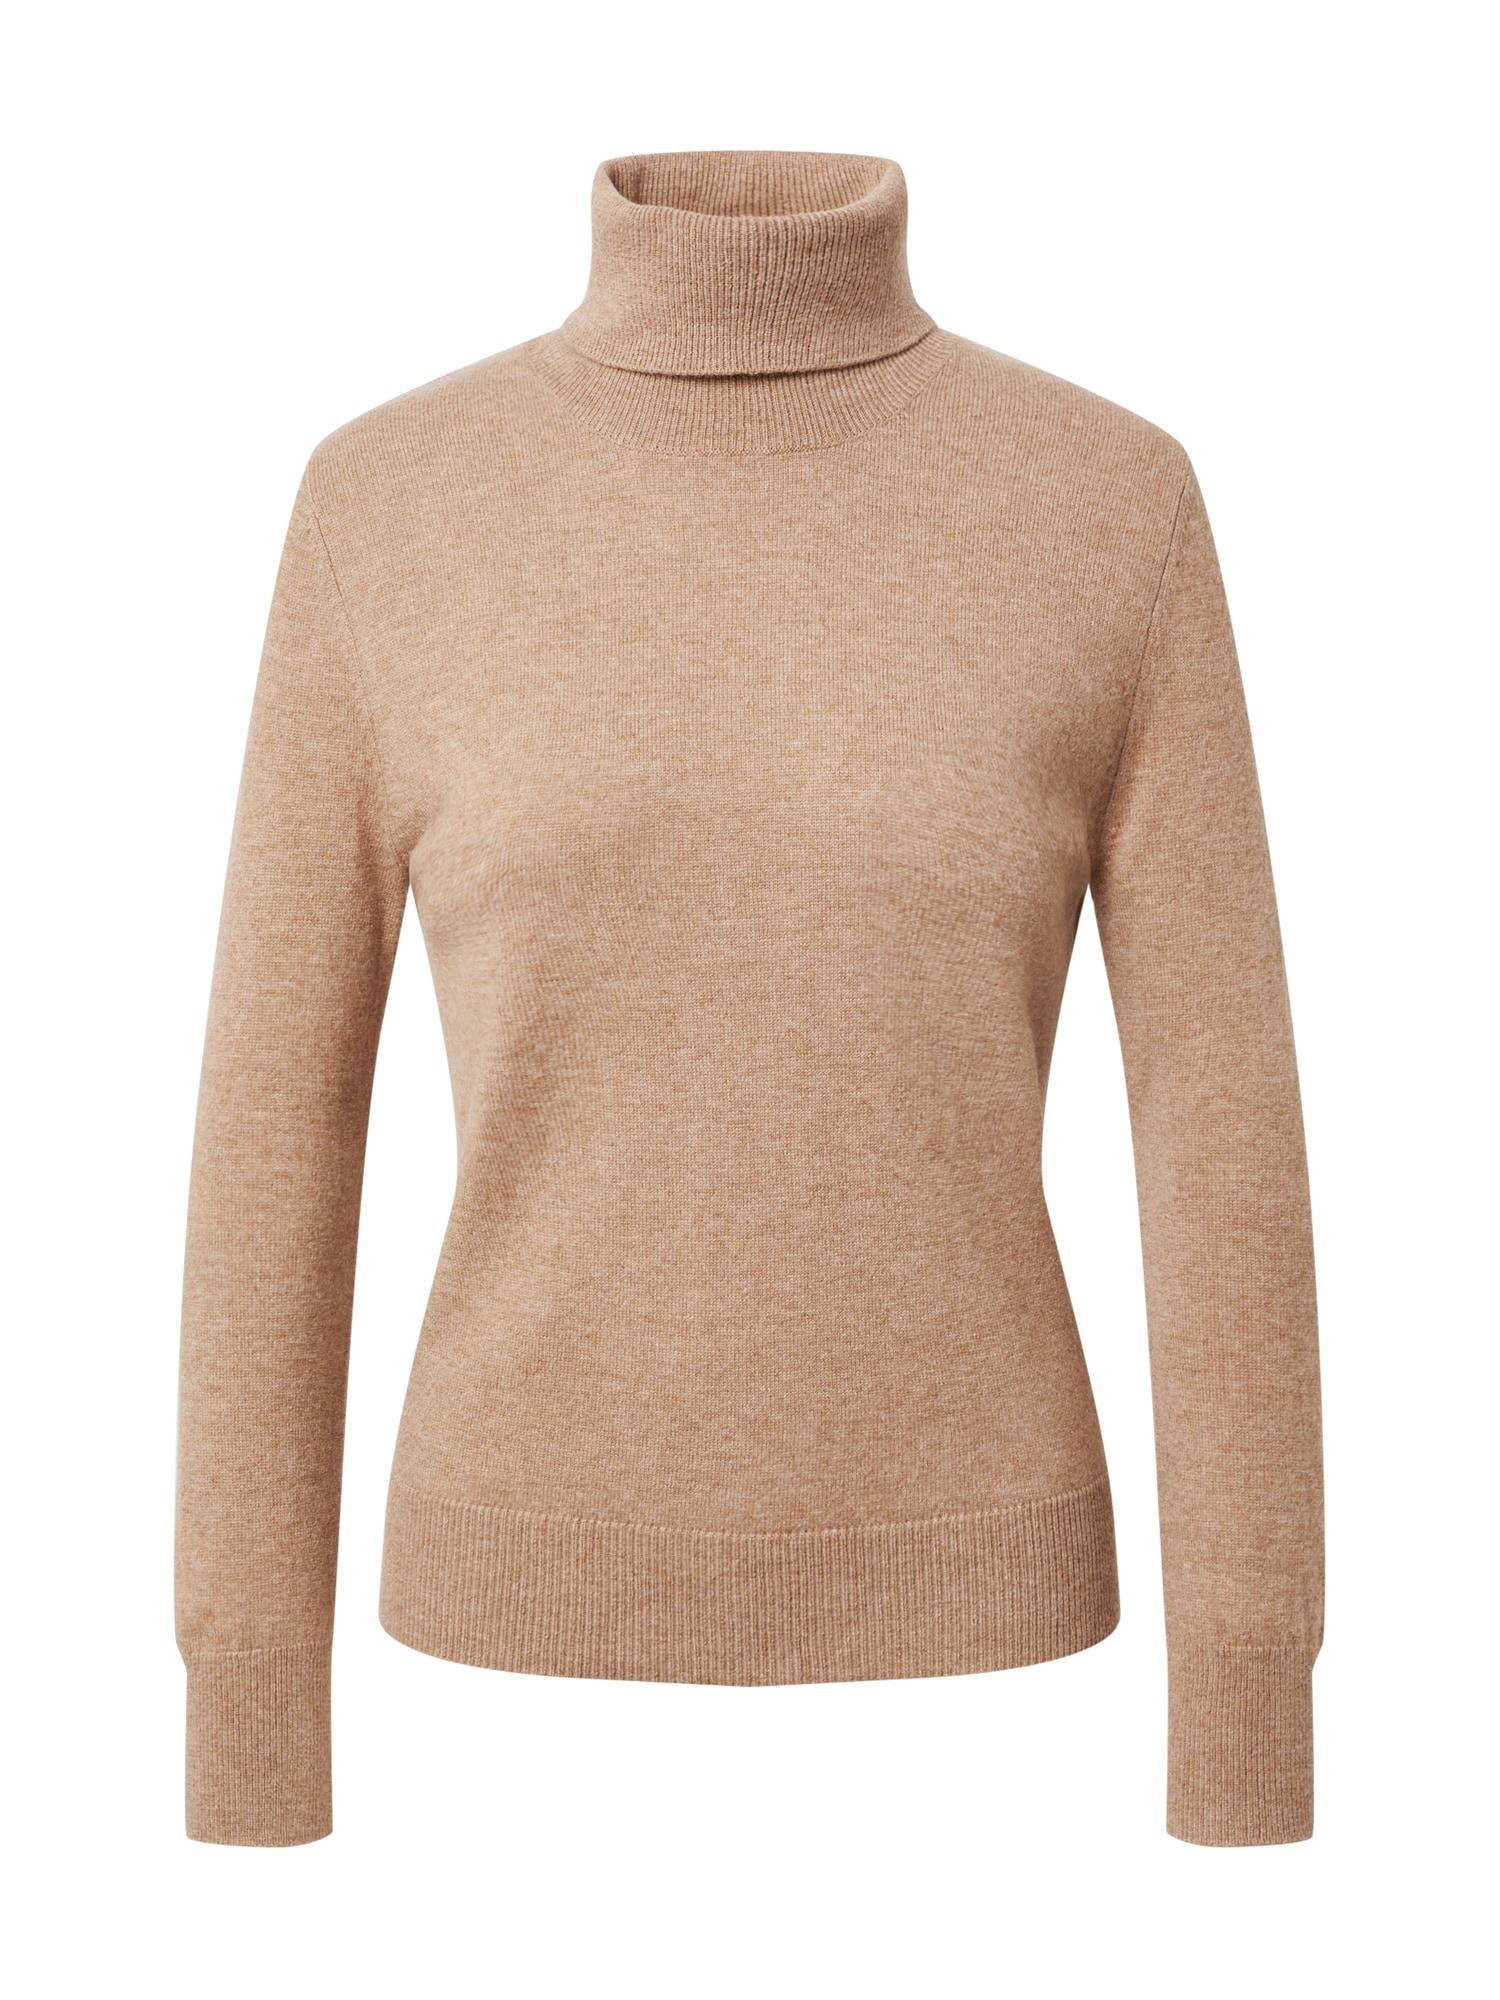 Pure Cashmere NYC Megztinis gelsvai pilka spalva